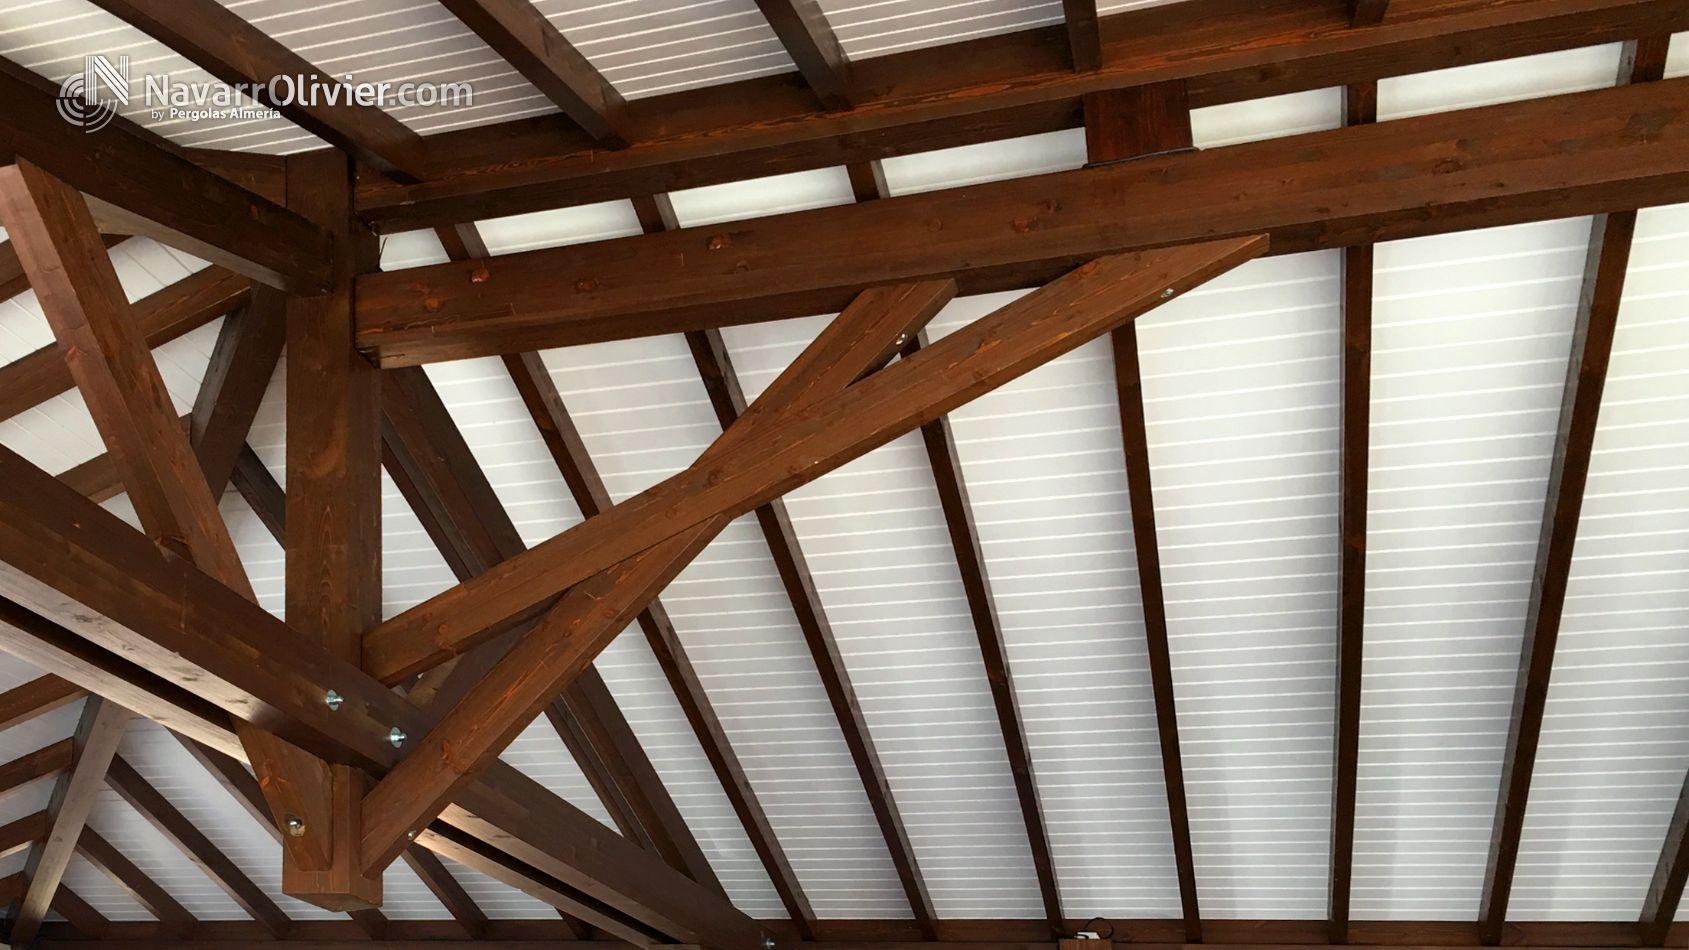 Pin de olivier navarro en estructuras pinterest vigas - Estructura madera laminada ...